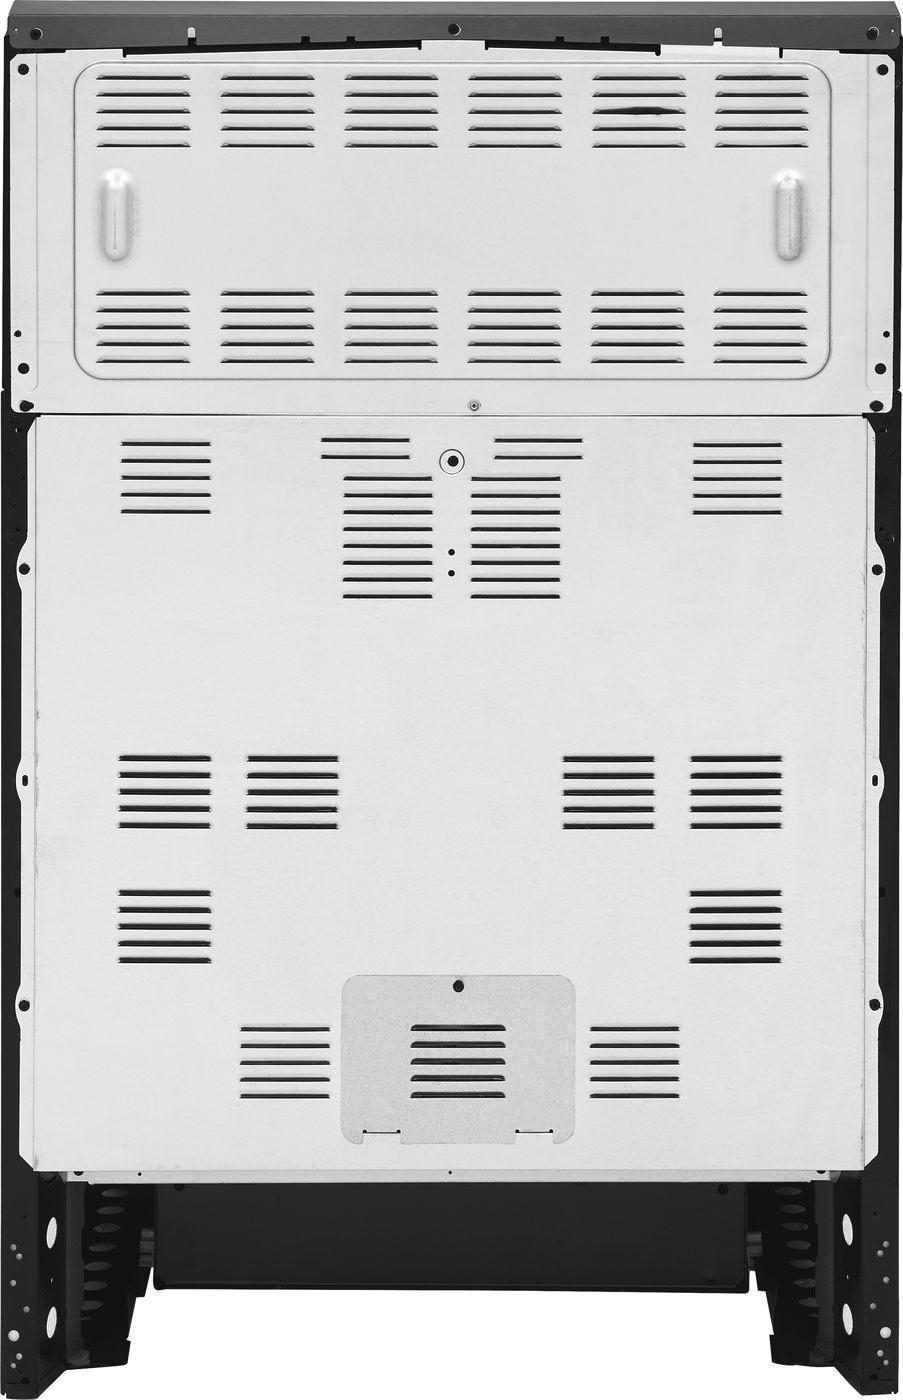 "Model: FGIF3036TD   Frigidaire Gallery 30"" Freestanding Induction Range"